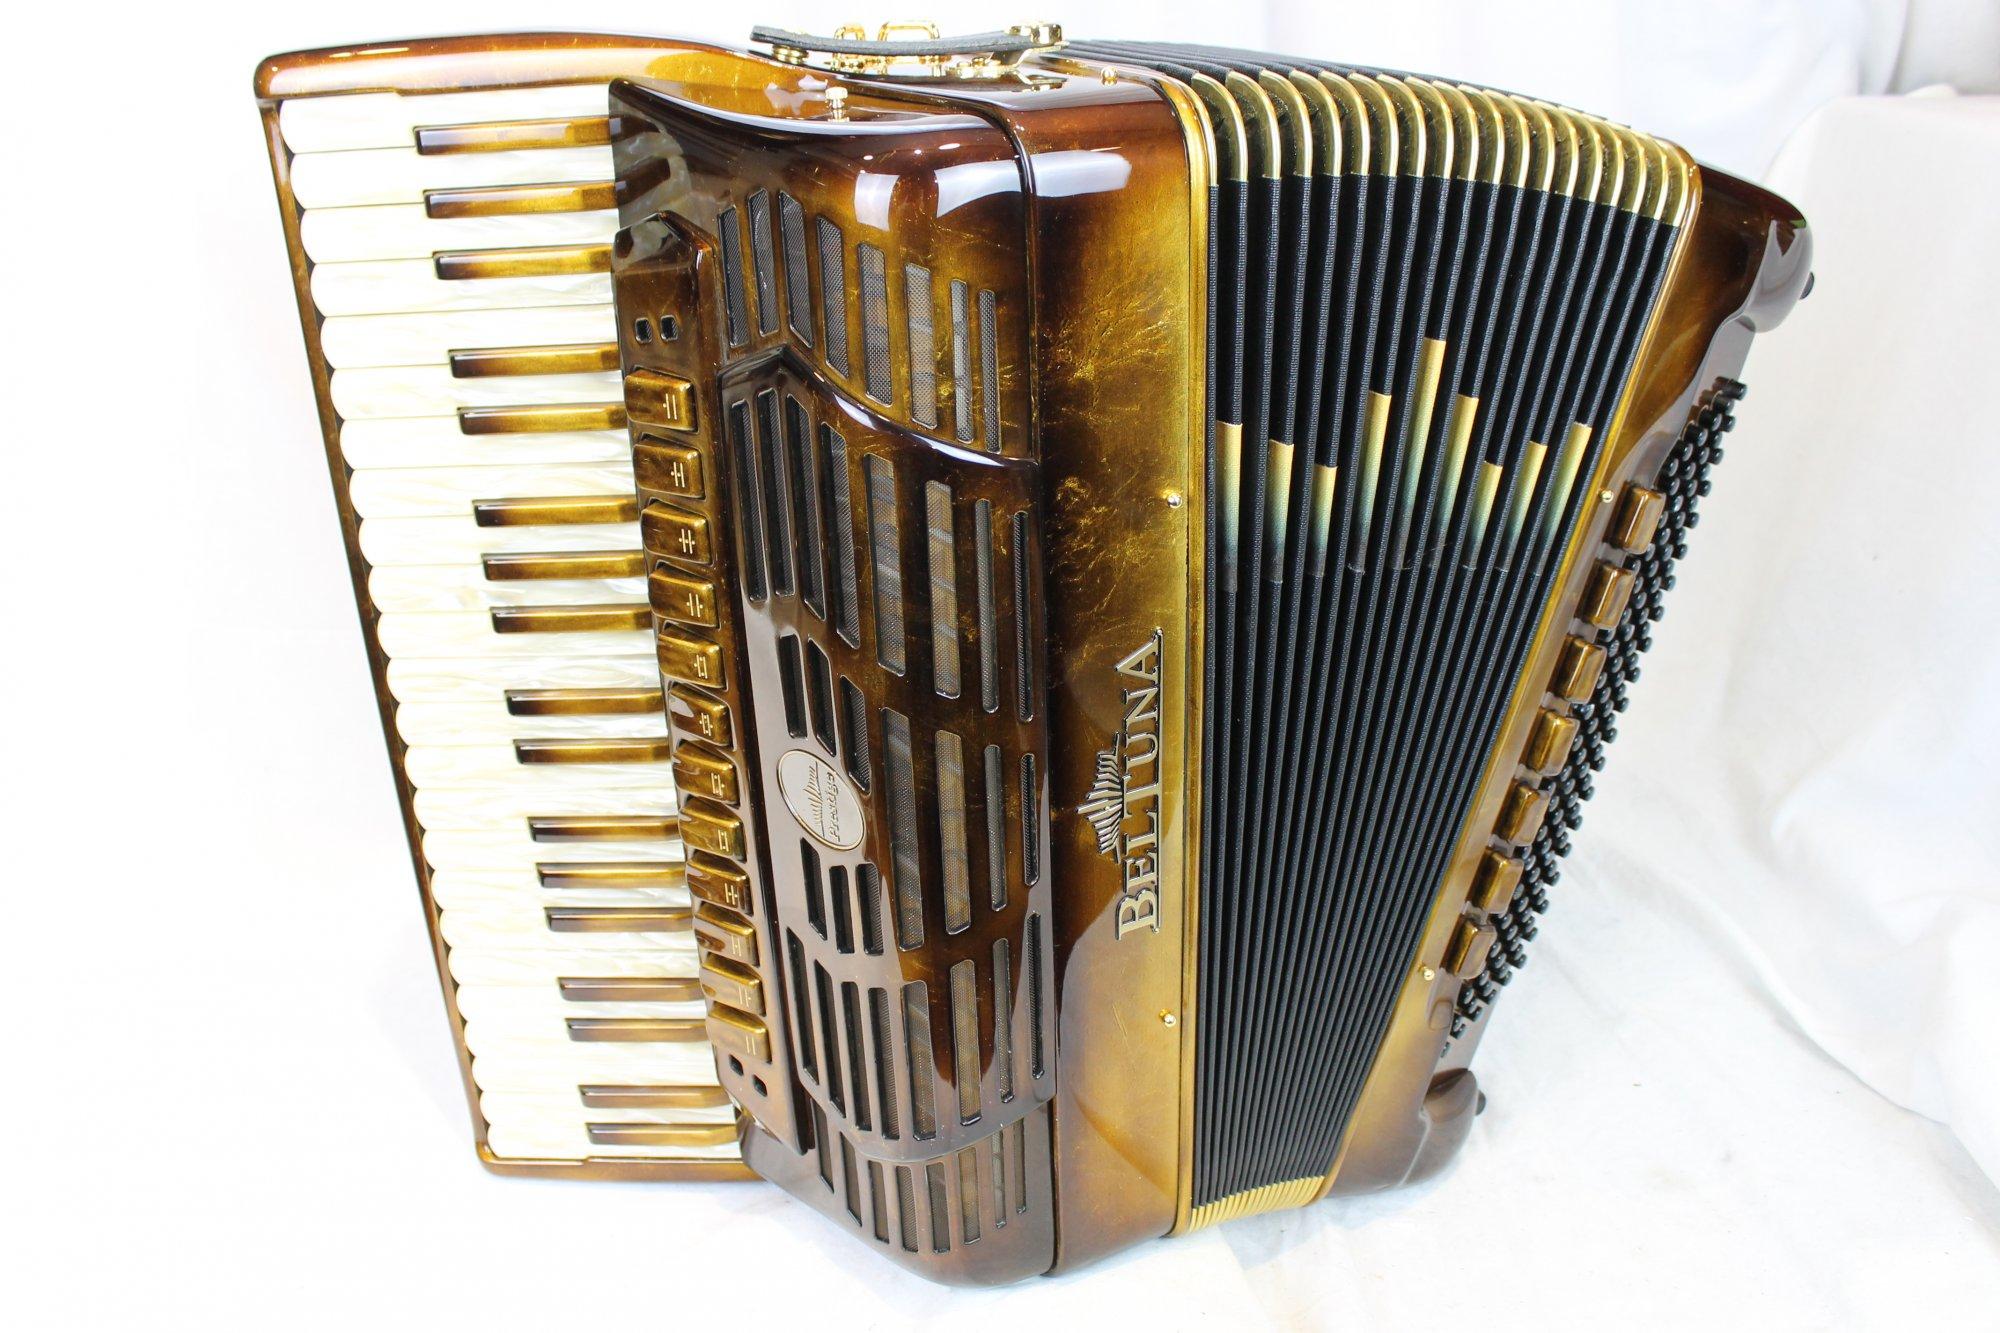 NEW Molten Gold Beltuna Prestige IV Piano Accordion LMMH 41 120